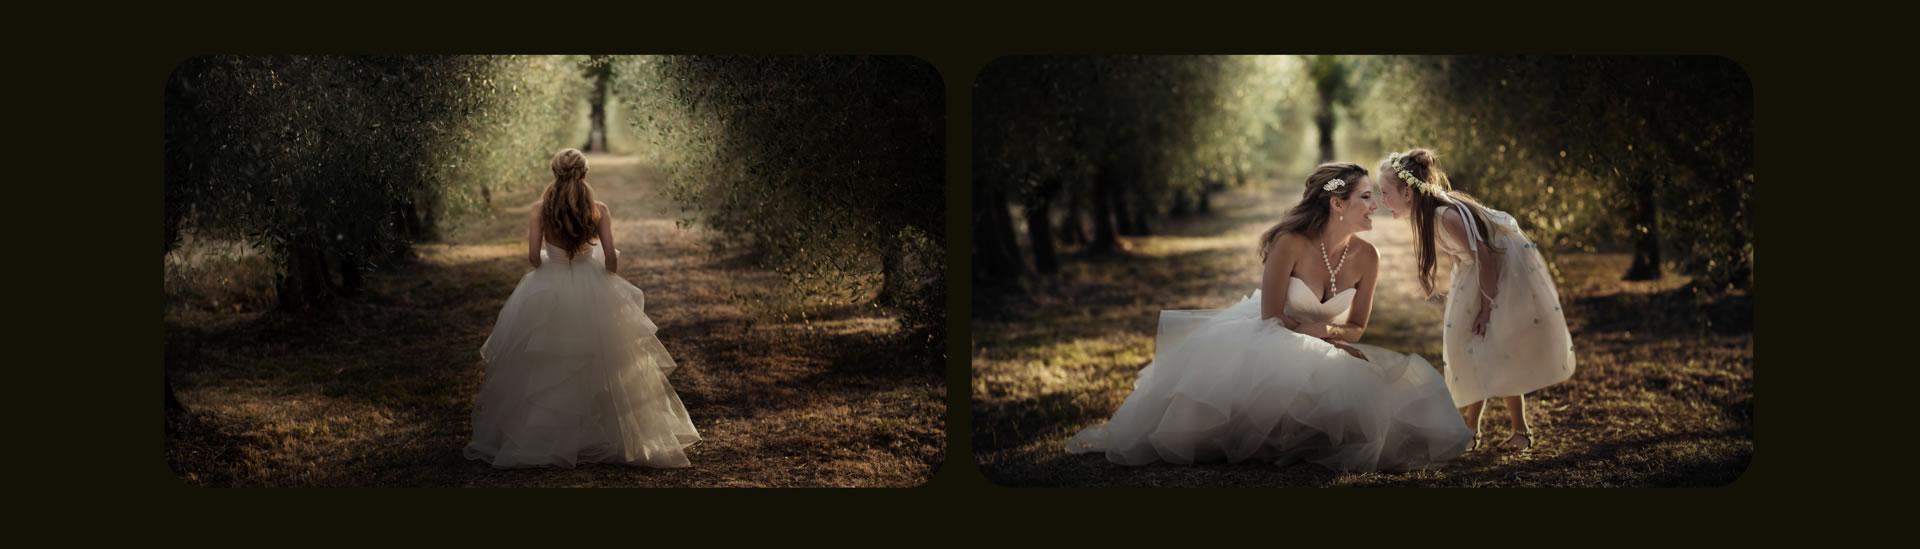 borgo-stomennano-david-bastianoni-photographer-00017 - 17 :: Wedding at Borgo Stomennano // WPPI 2018 // Our love is here to stay :: Luxury wedding photography - 16 :: borgo-stomennano-david-bastianoni-photographer-00017 - 17